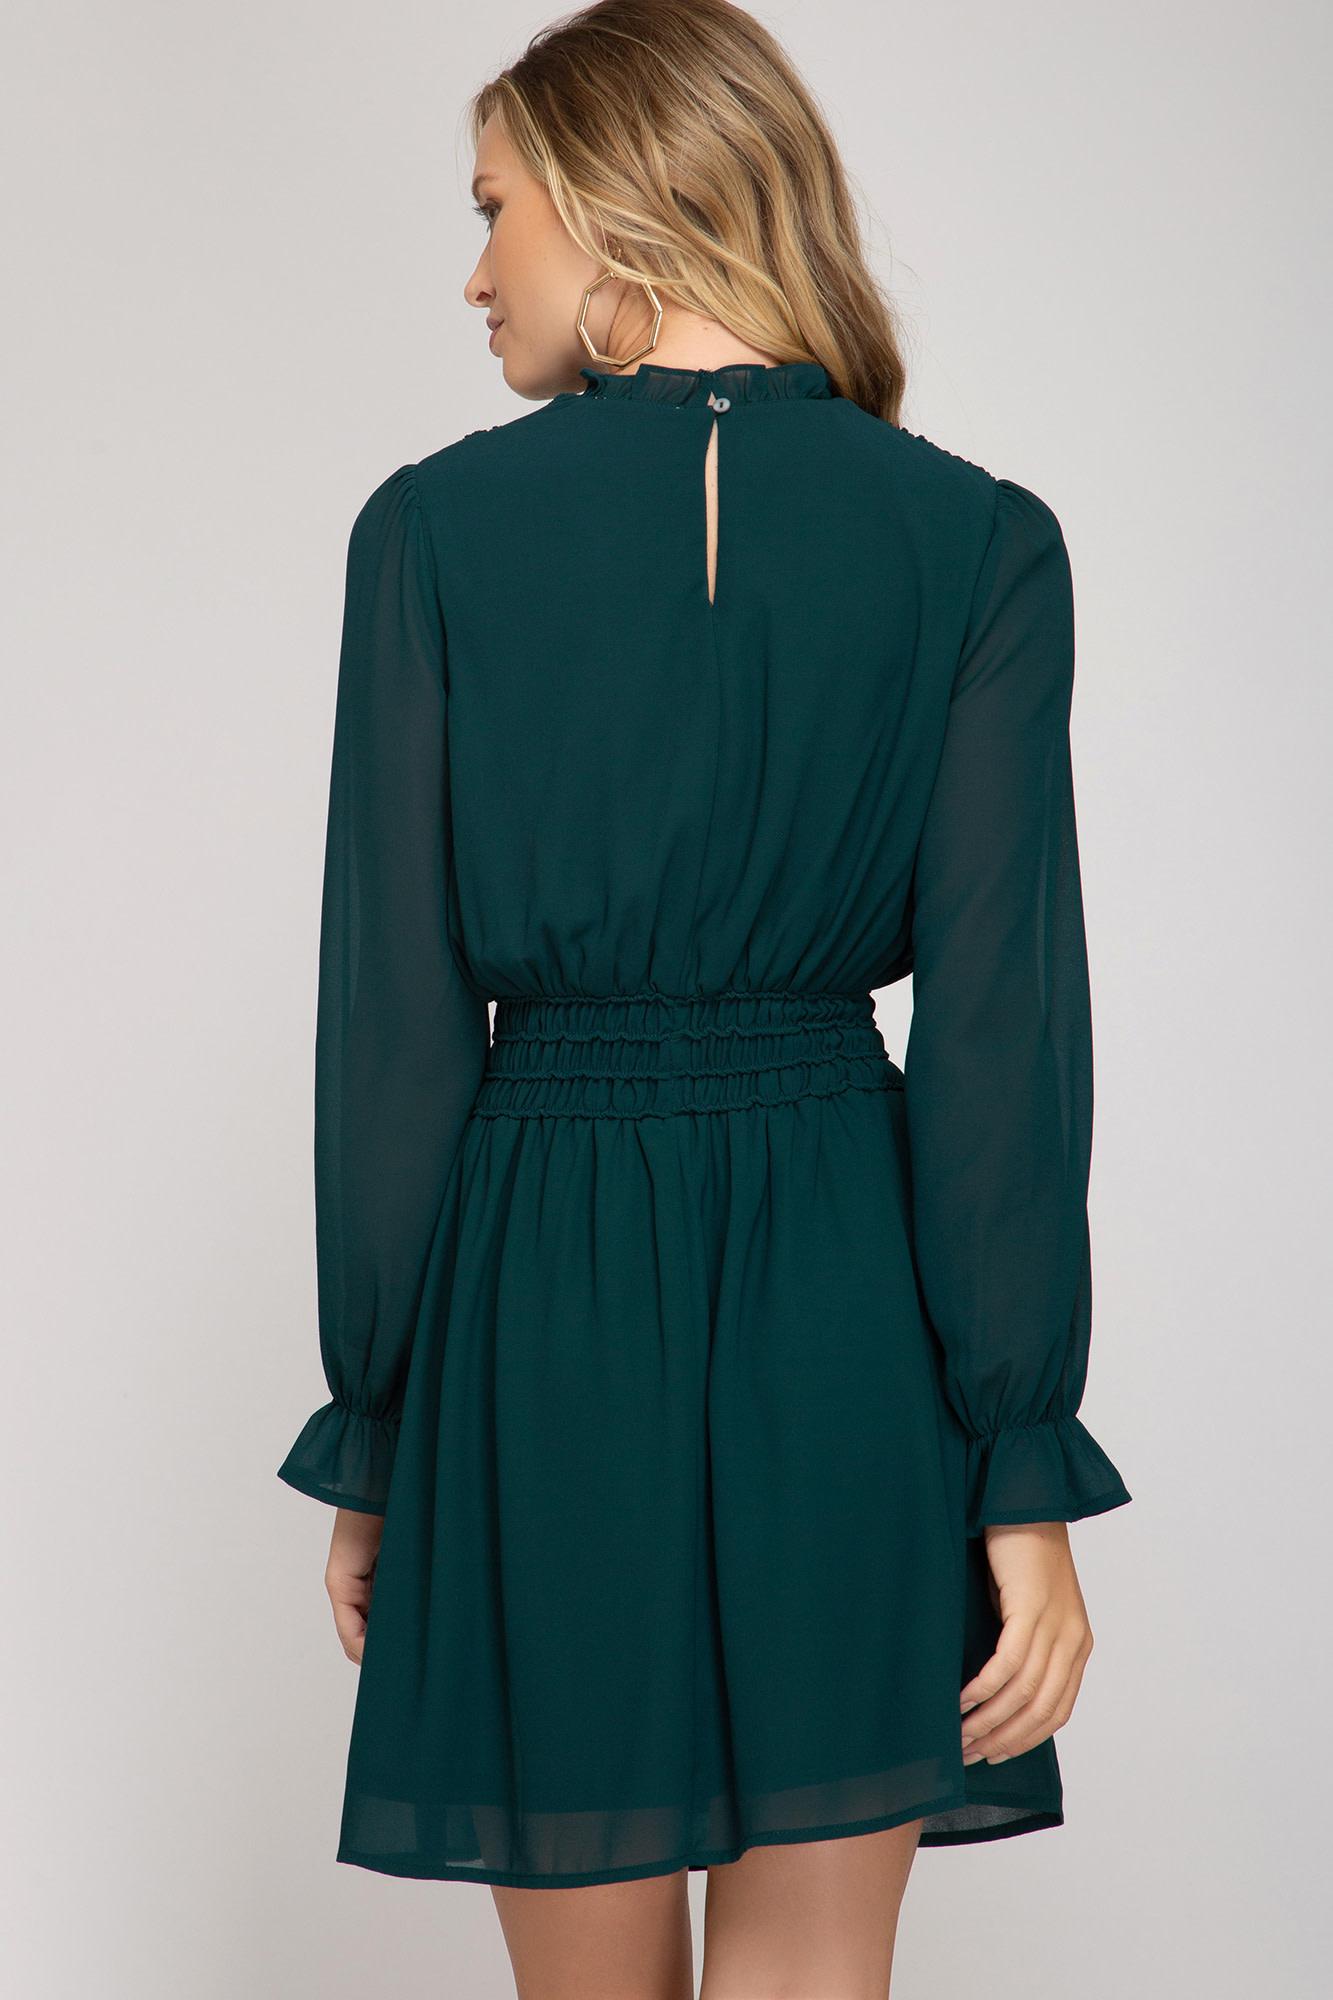 She + Sky Long Sleeve Smocked Dress